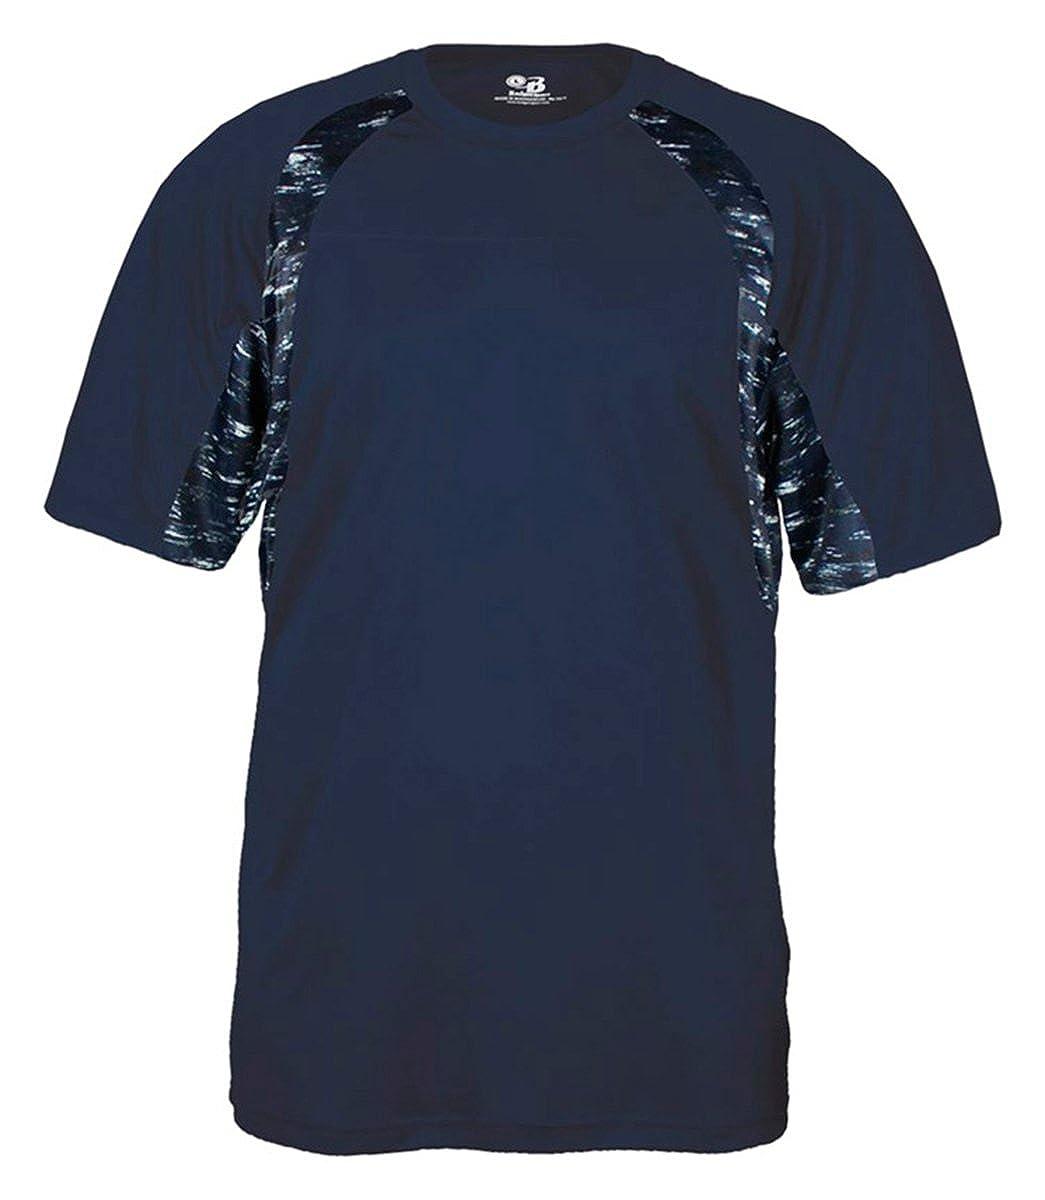 Badger Big Boys Static Hook T-Shirt Navy// Navy Static X-Small